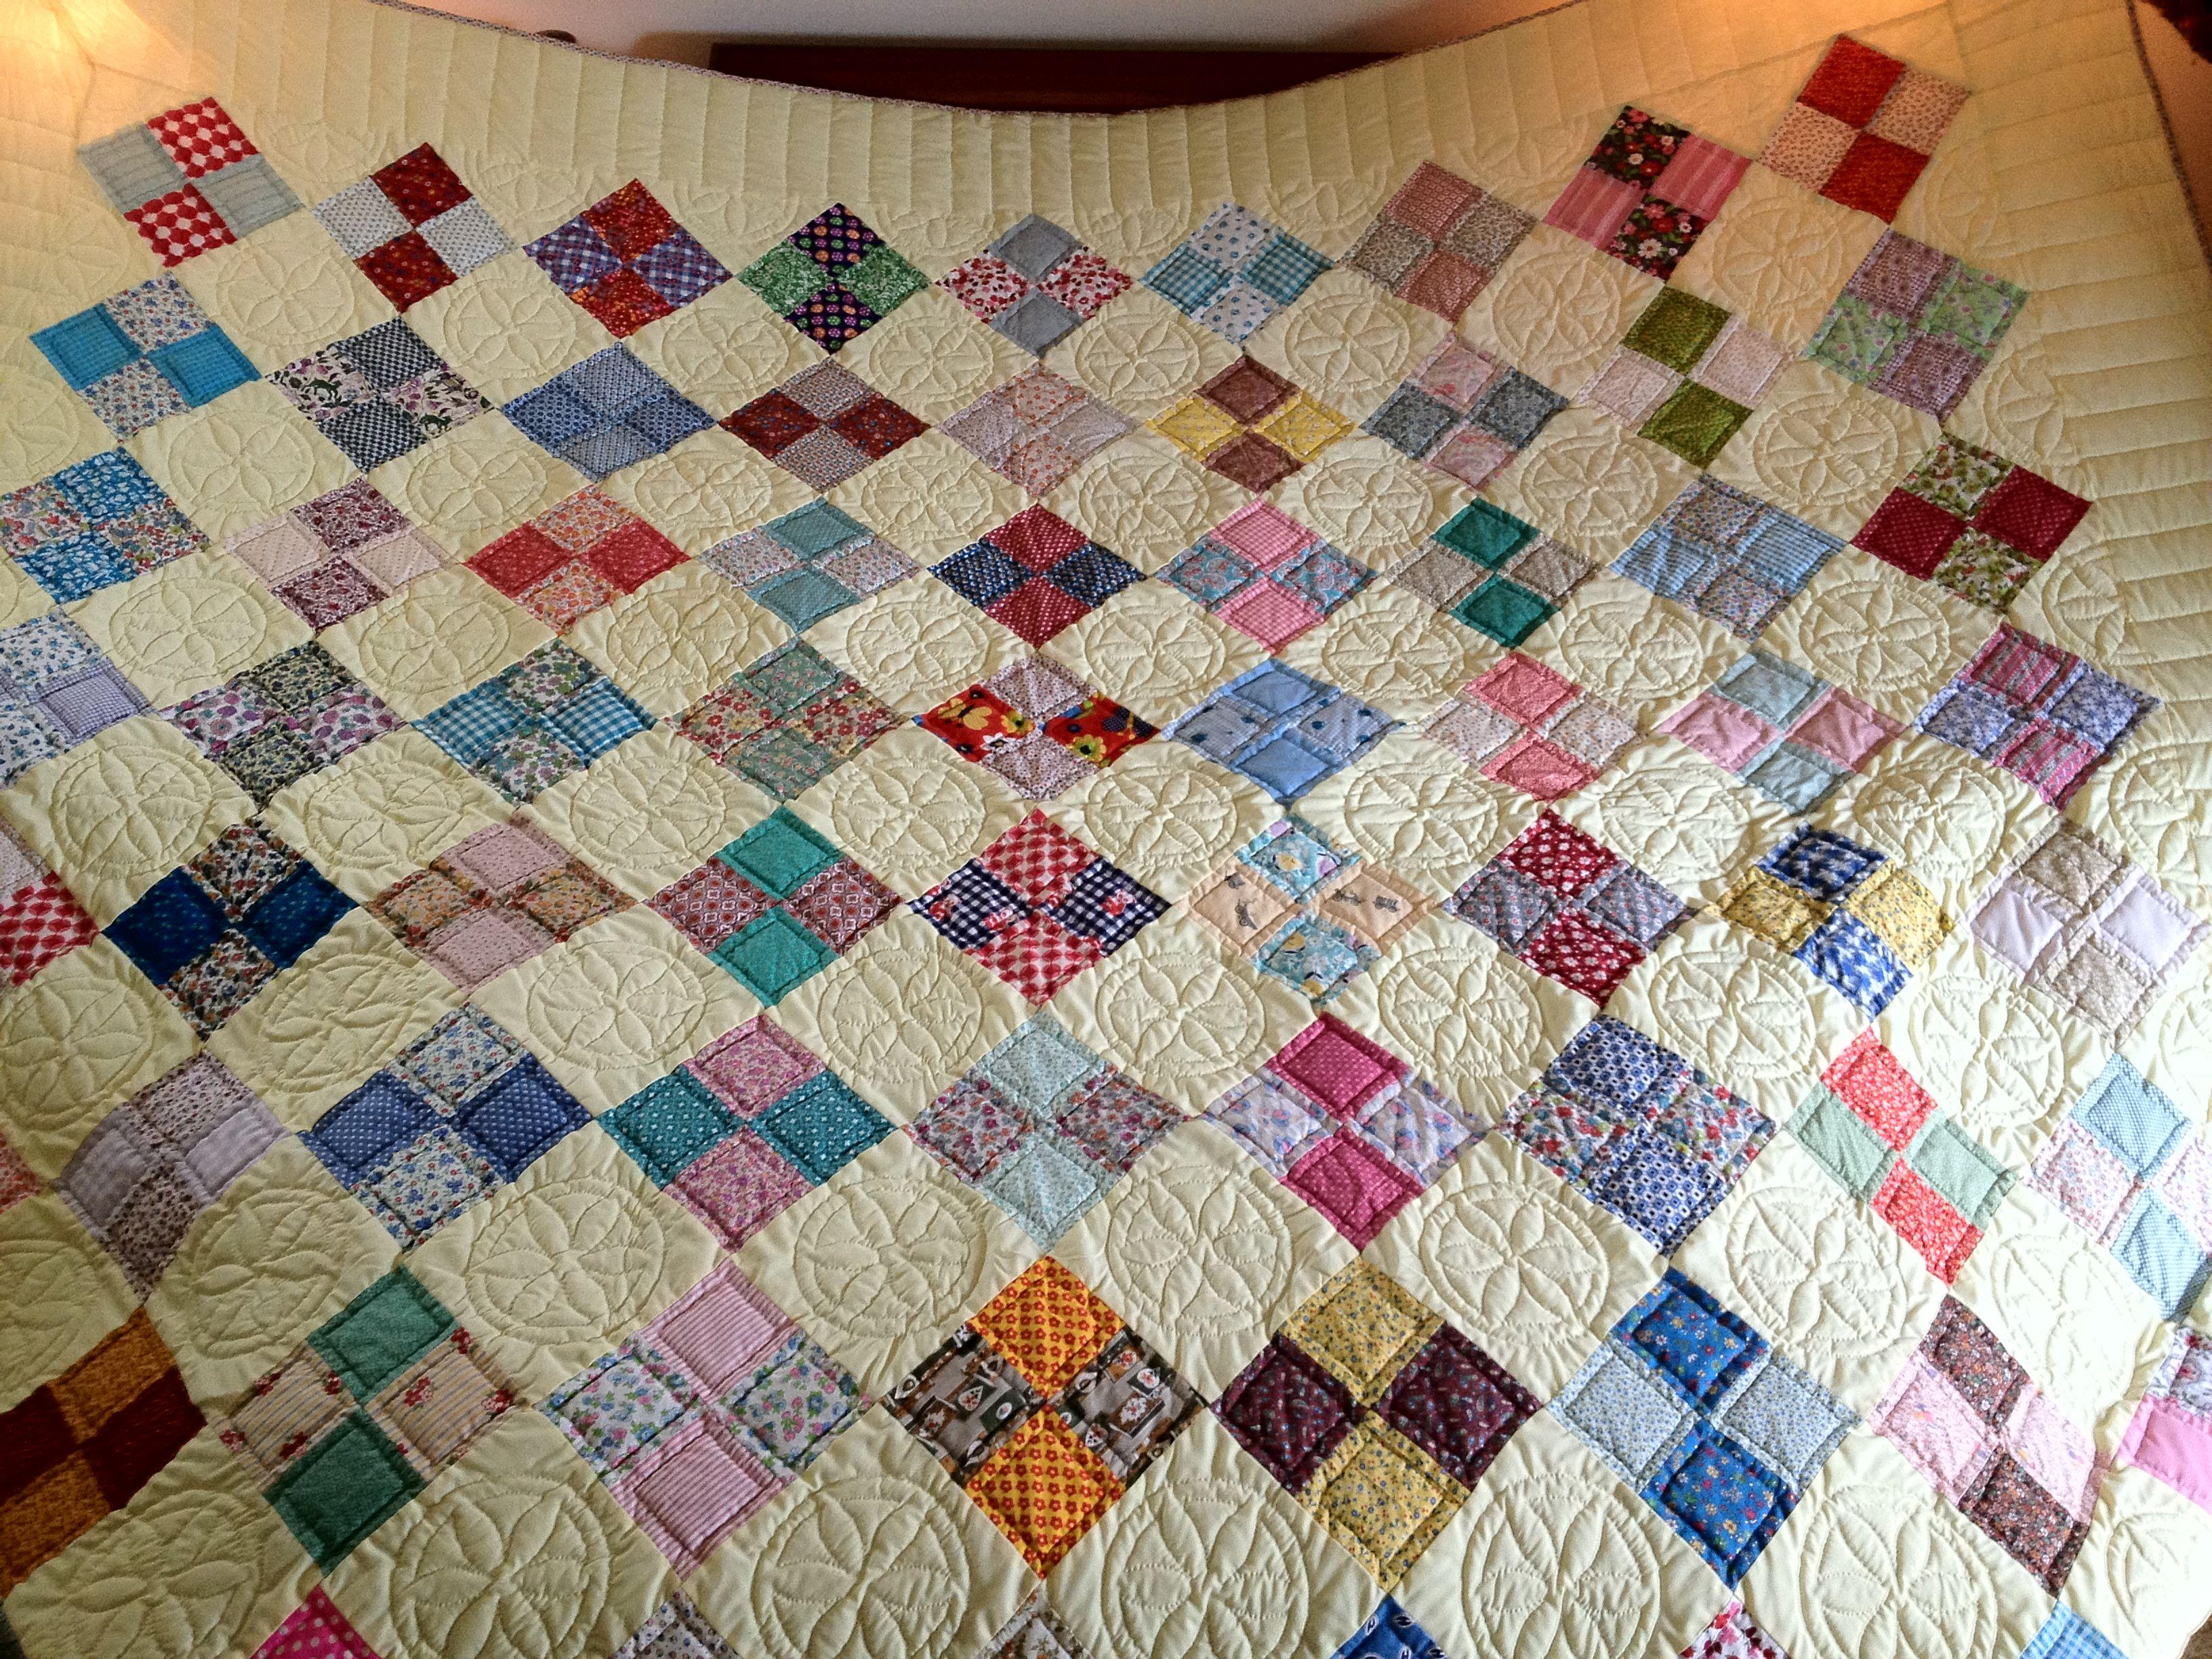 Irene Nolt 8x9 Four Patch Quilt For Holly 4 Patch Quilt Patch Quilt Quilts